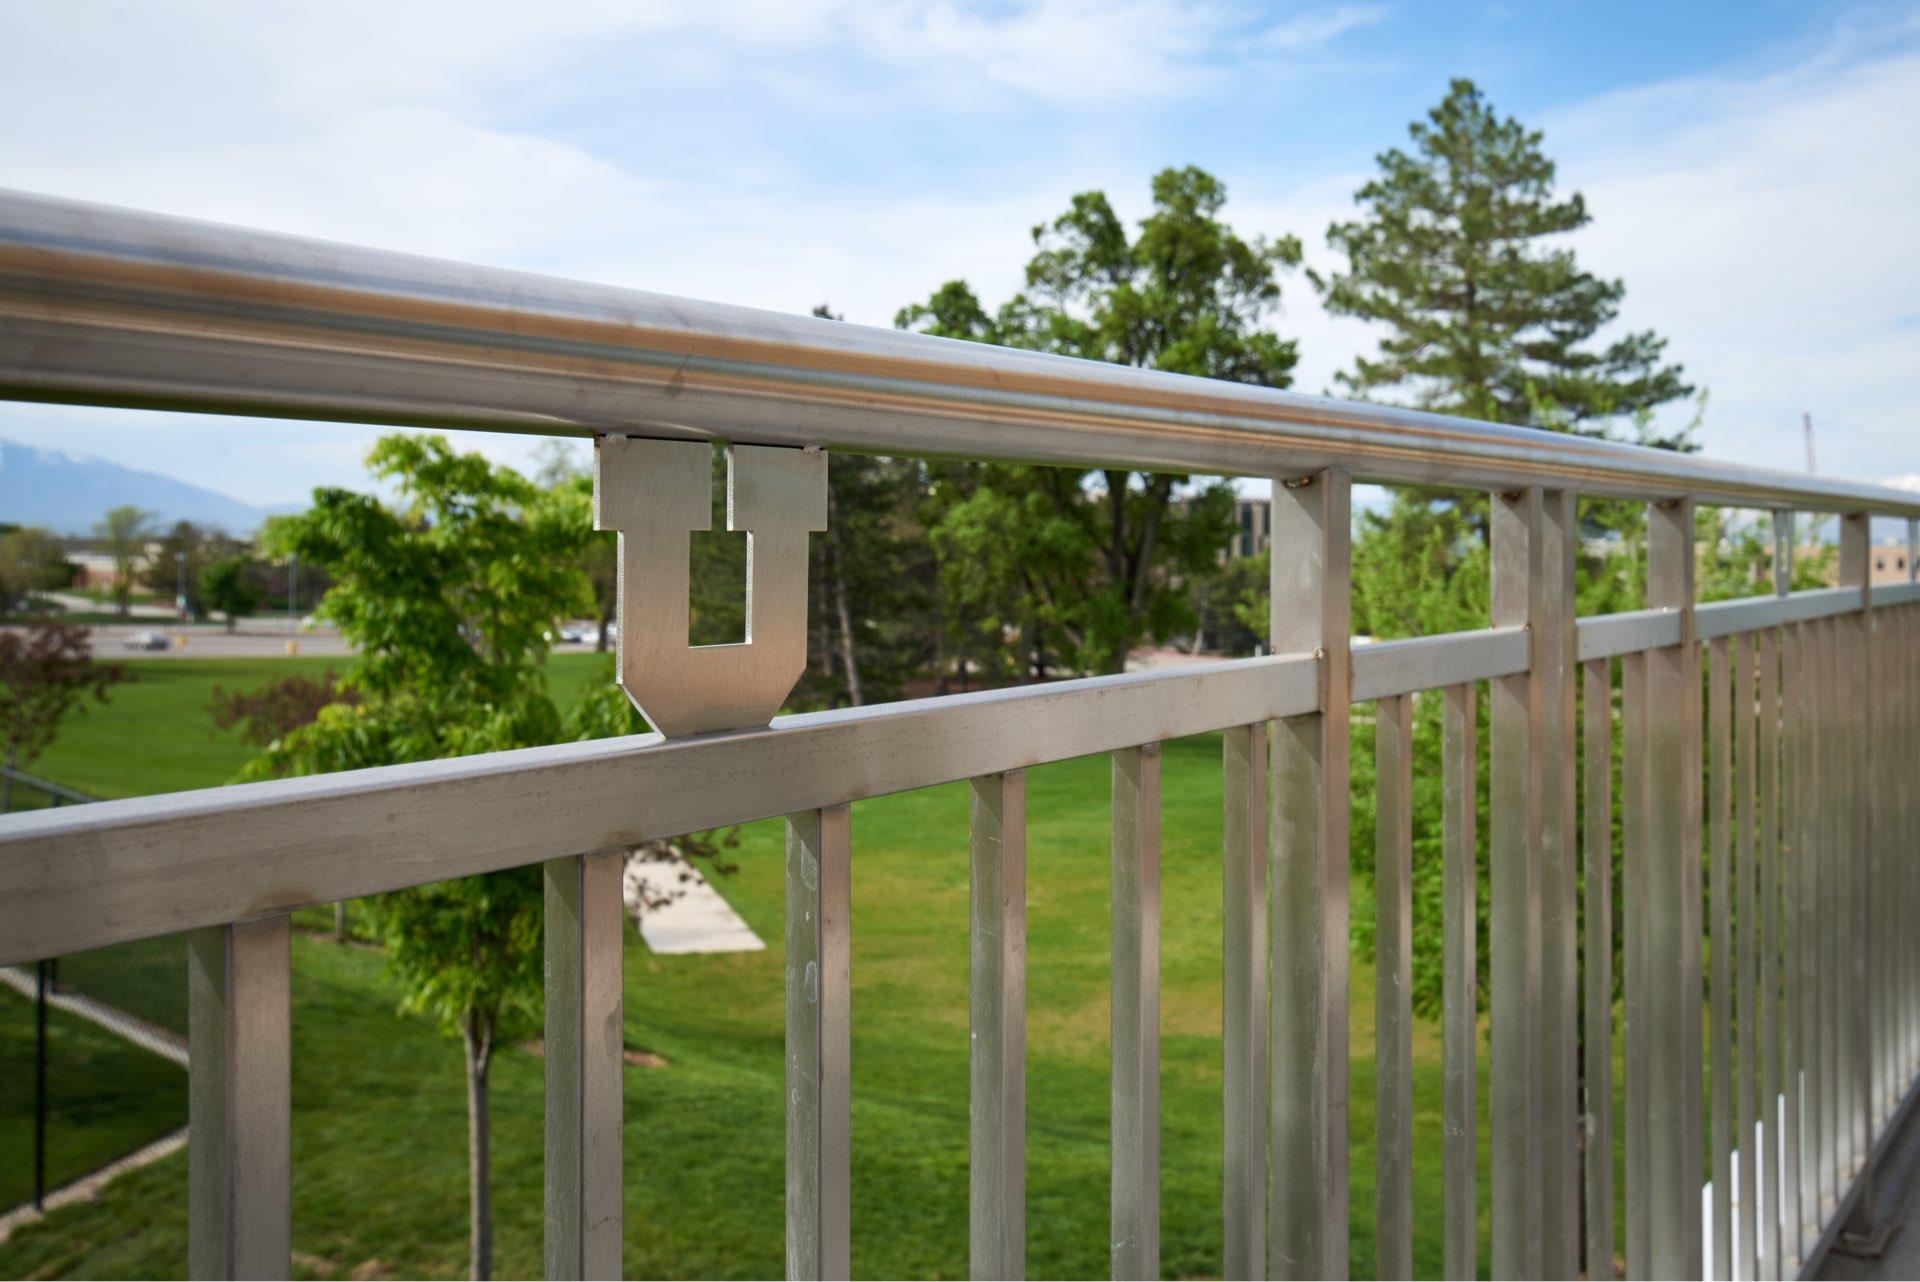 Hand railing, University of Utah Ski Team Building, architectural design by Elliott Workgroup